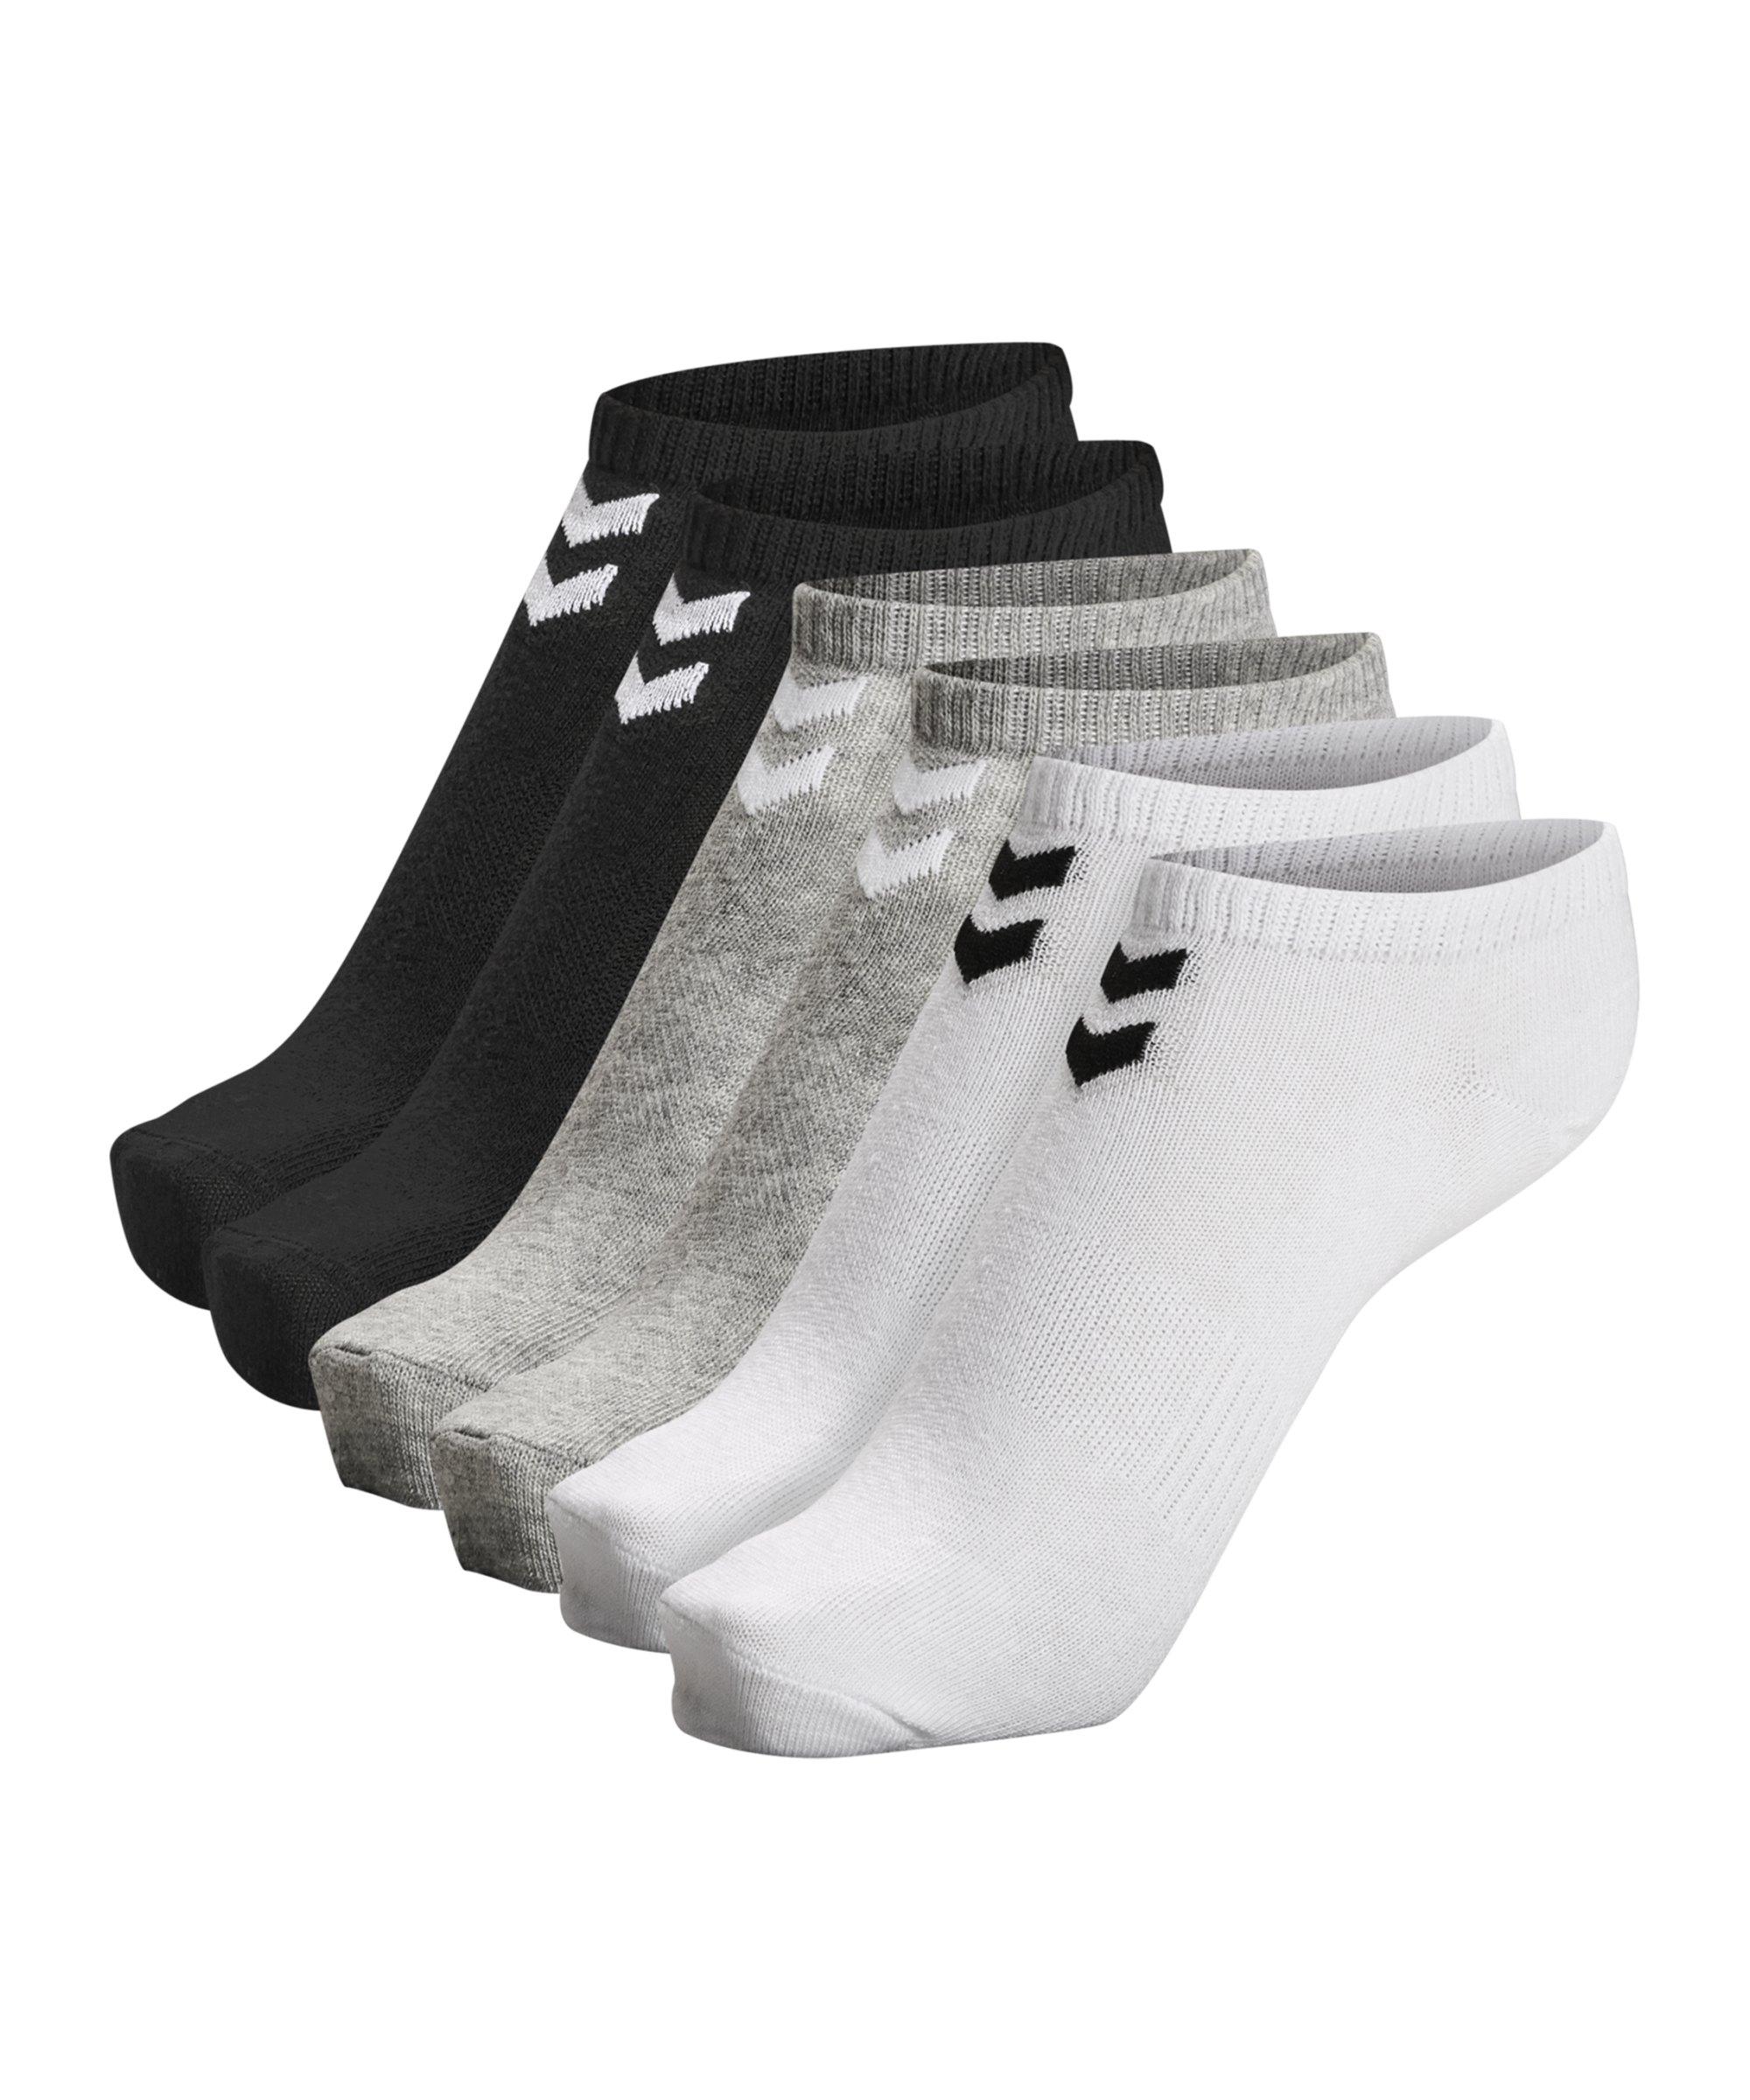 Hummel hmlchevron 6-Pack Ankle Socken F9034 - weiss